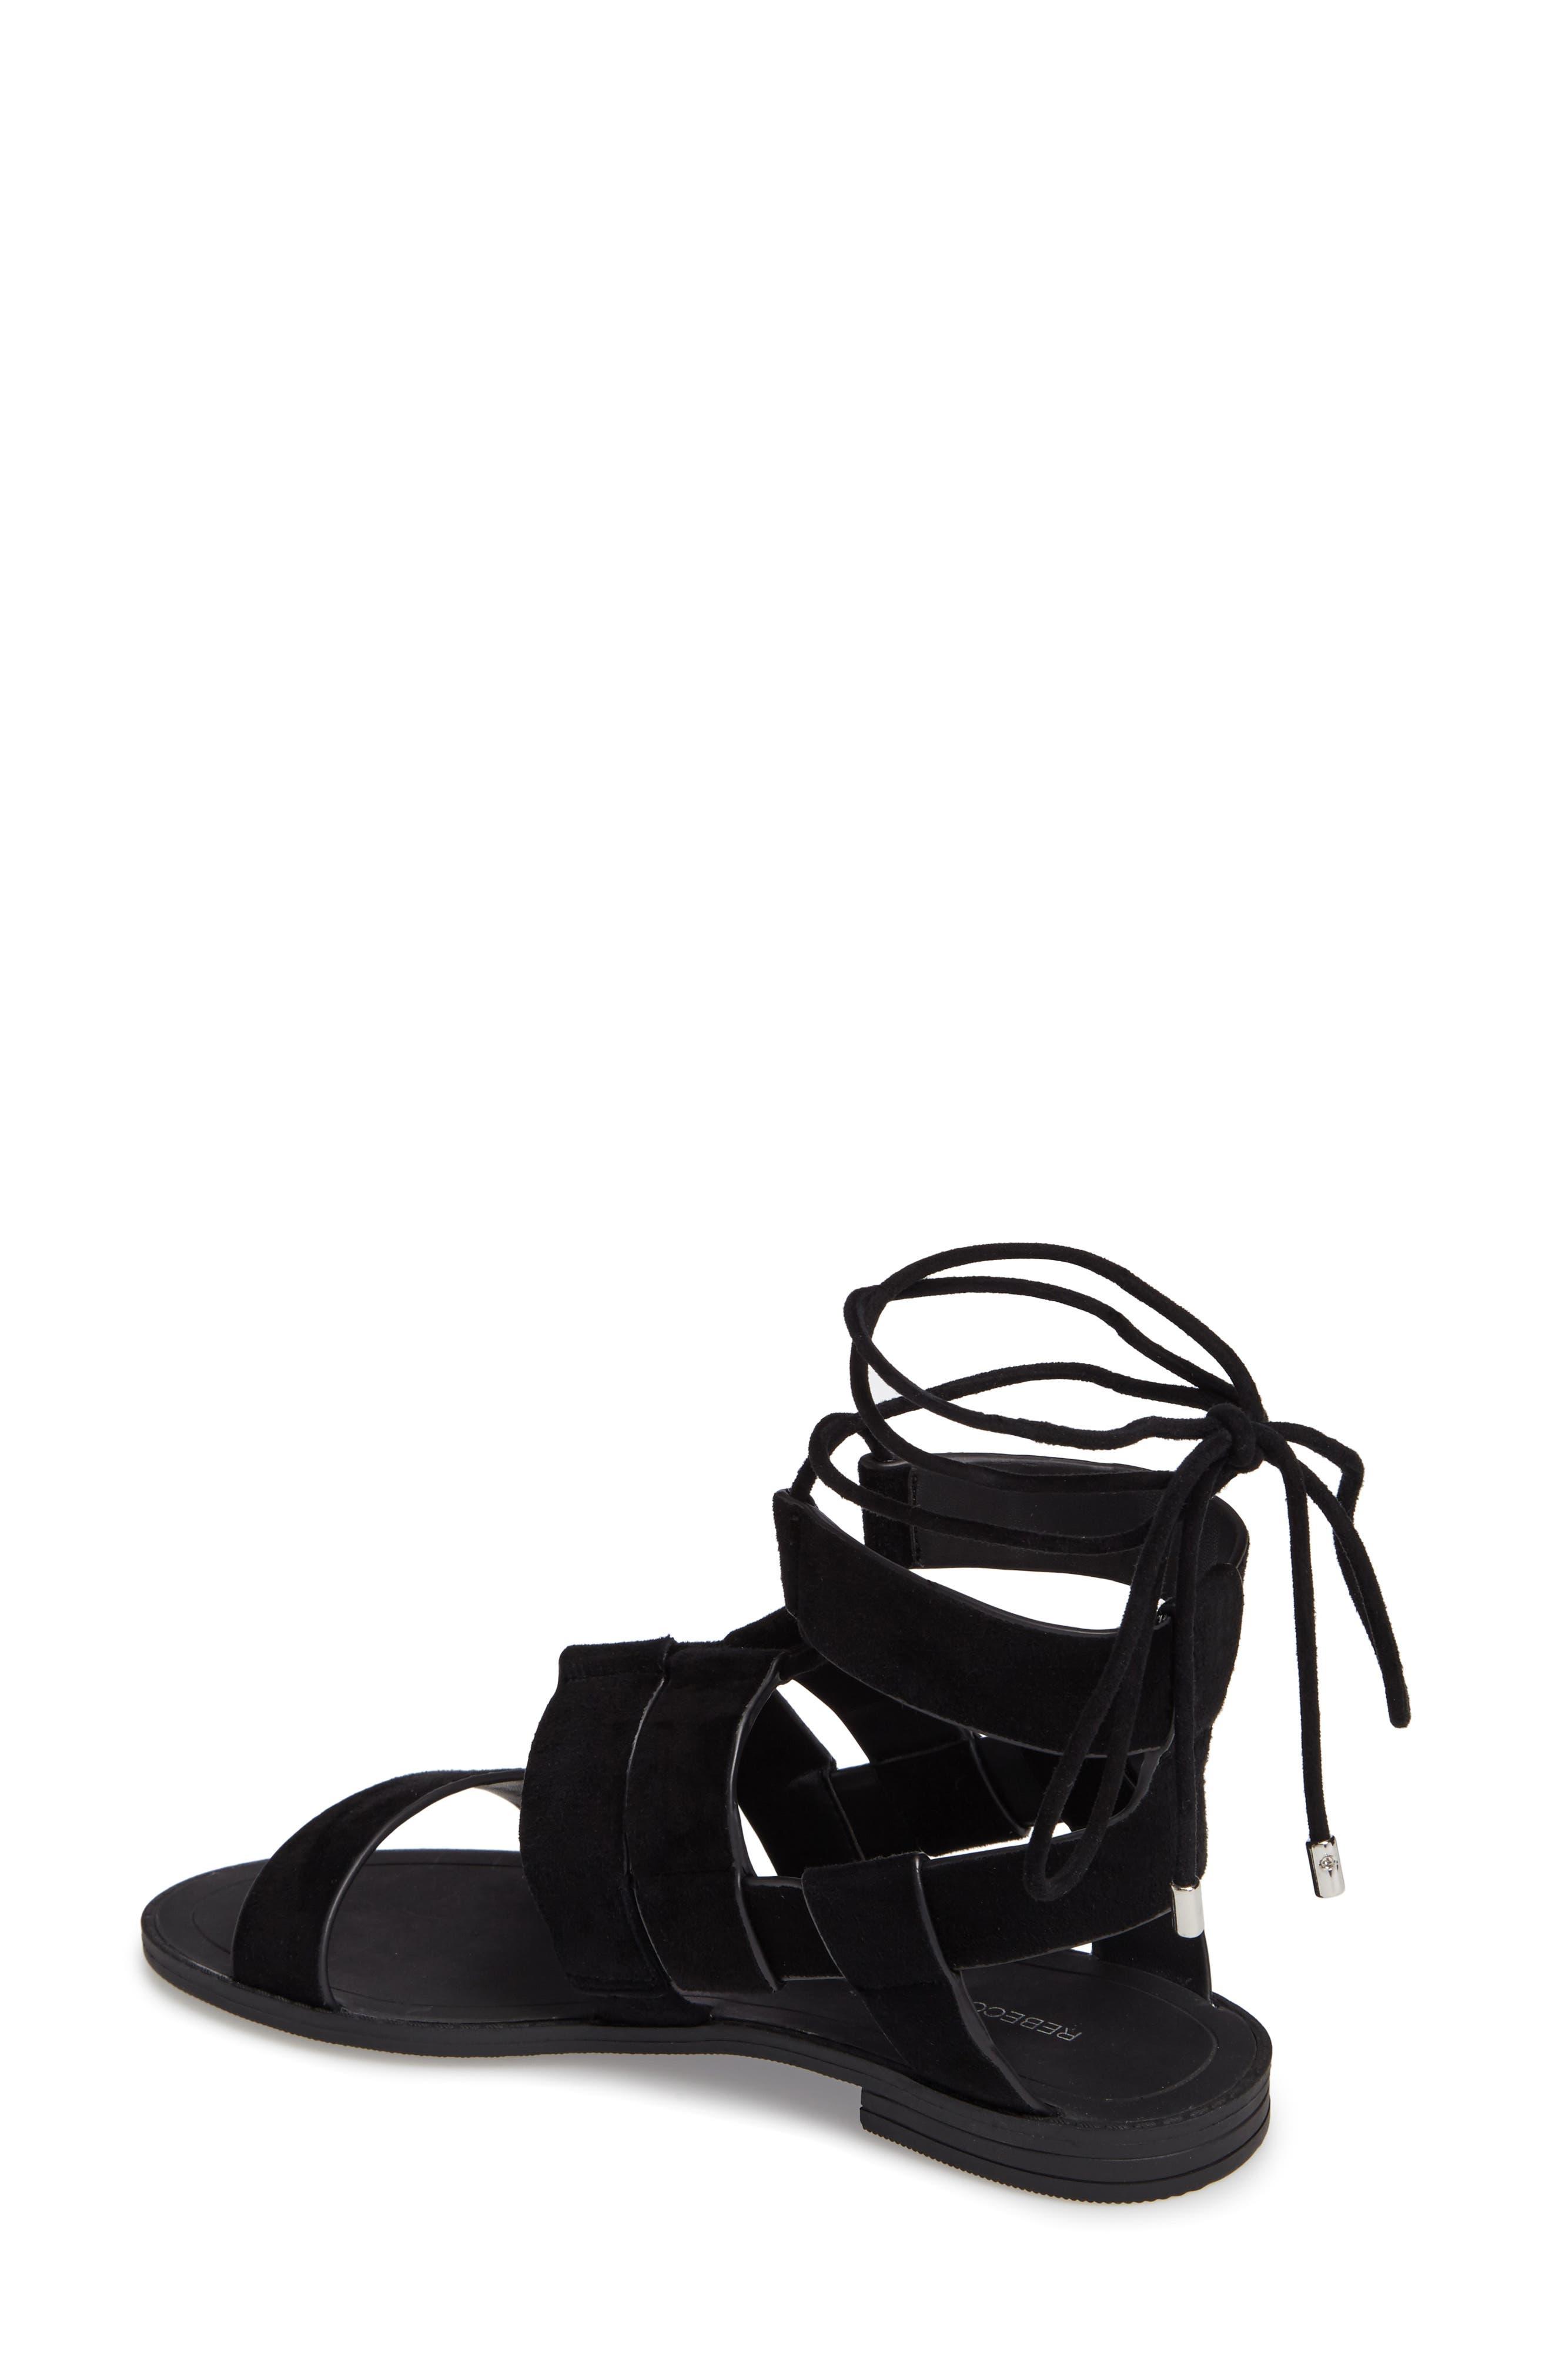 Giada Strappy Sandal,                             Alternate thumbnail 2, color,                             001